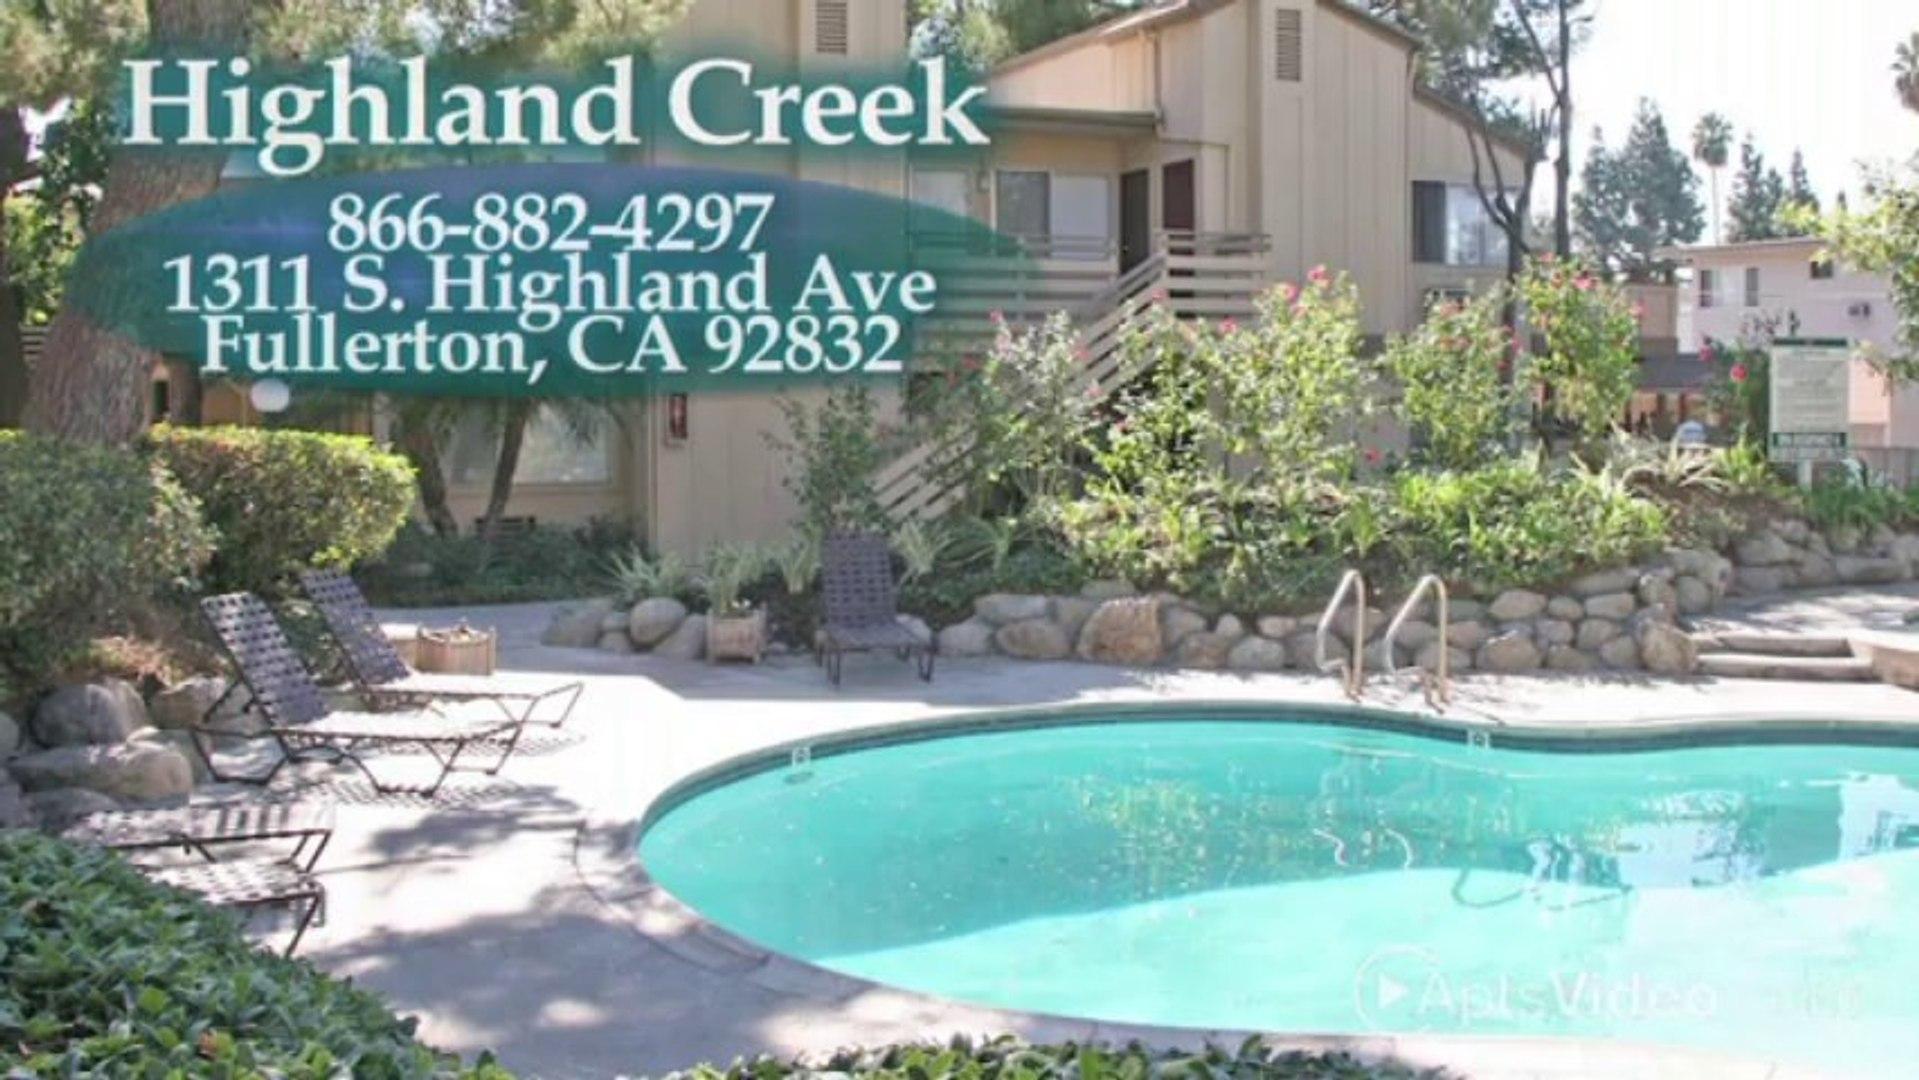 Highland Creek Apartments in Fullerton, CA - ForRent.com ...